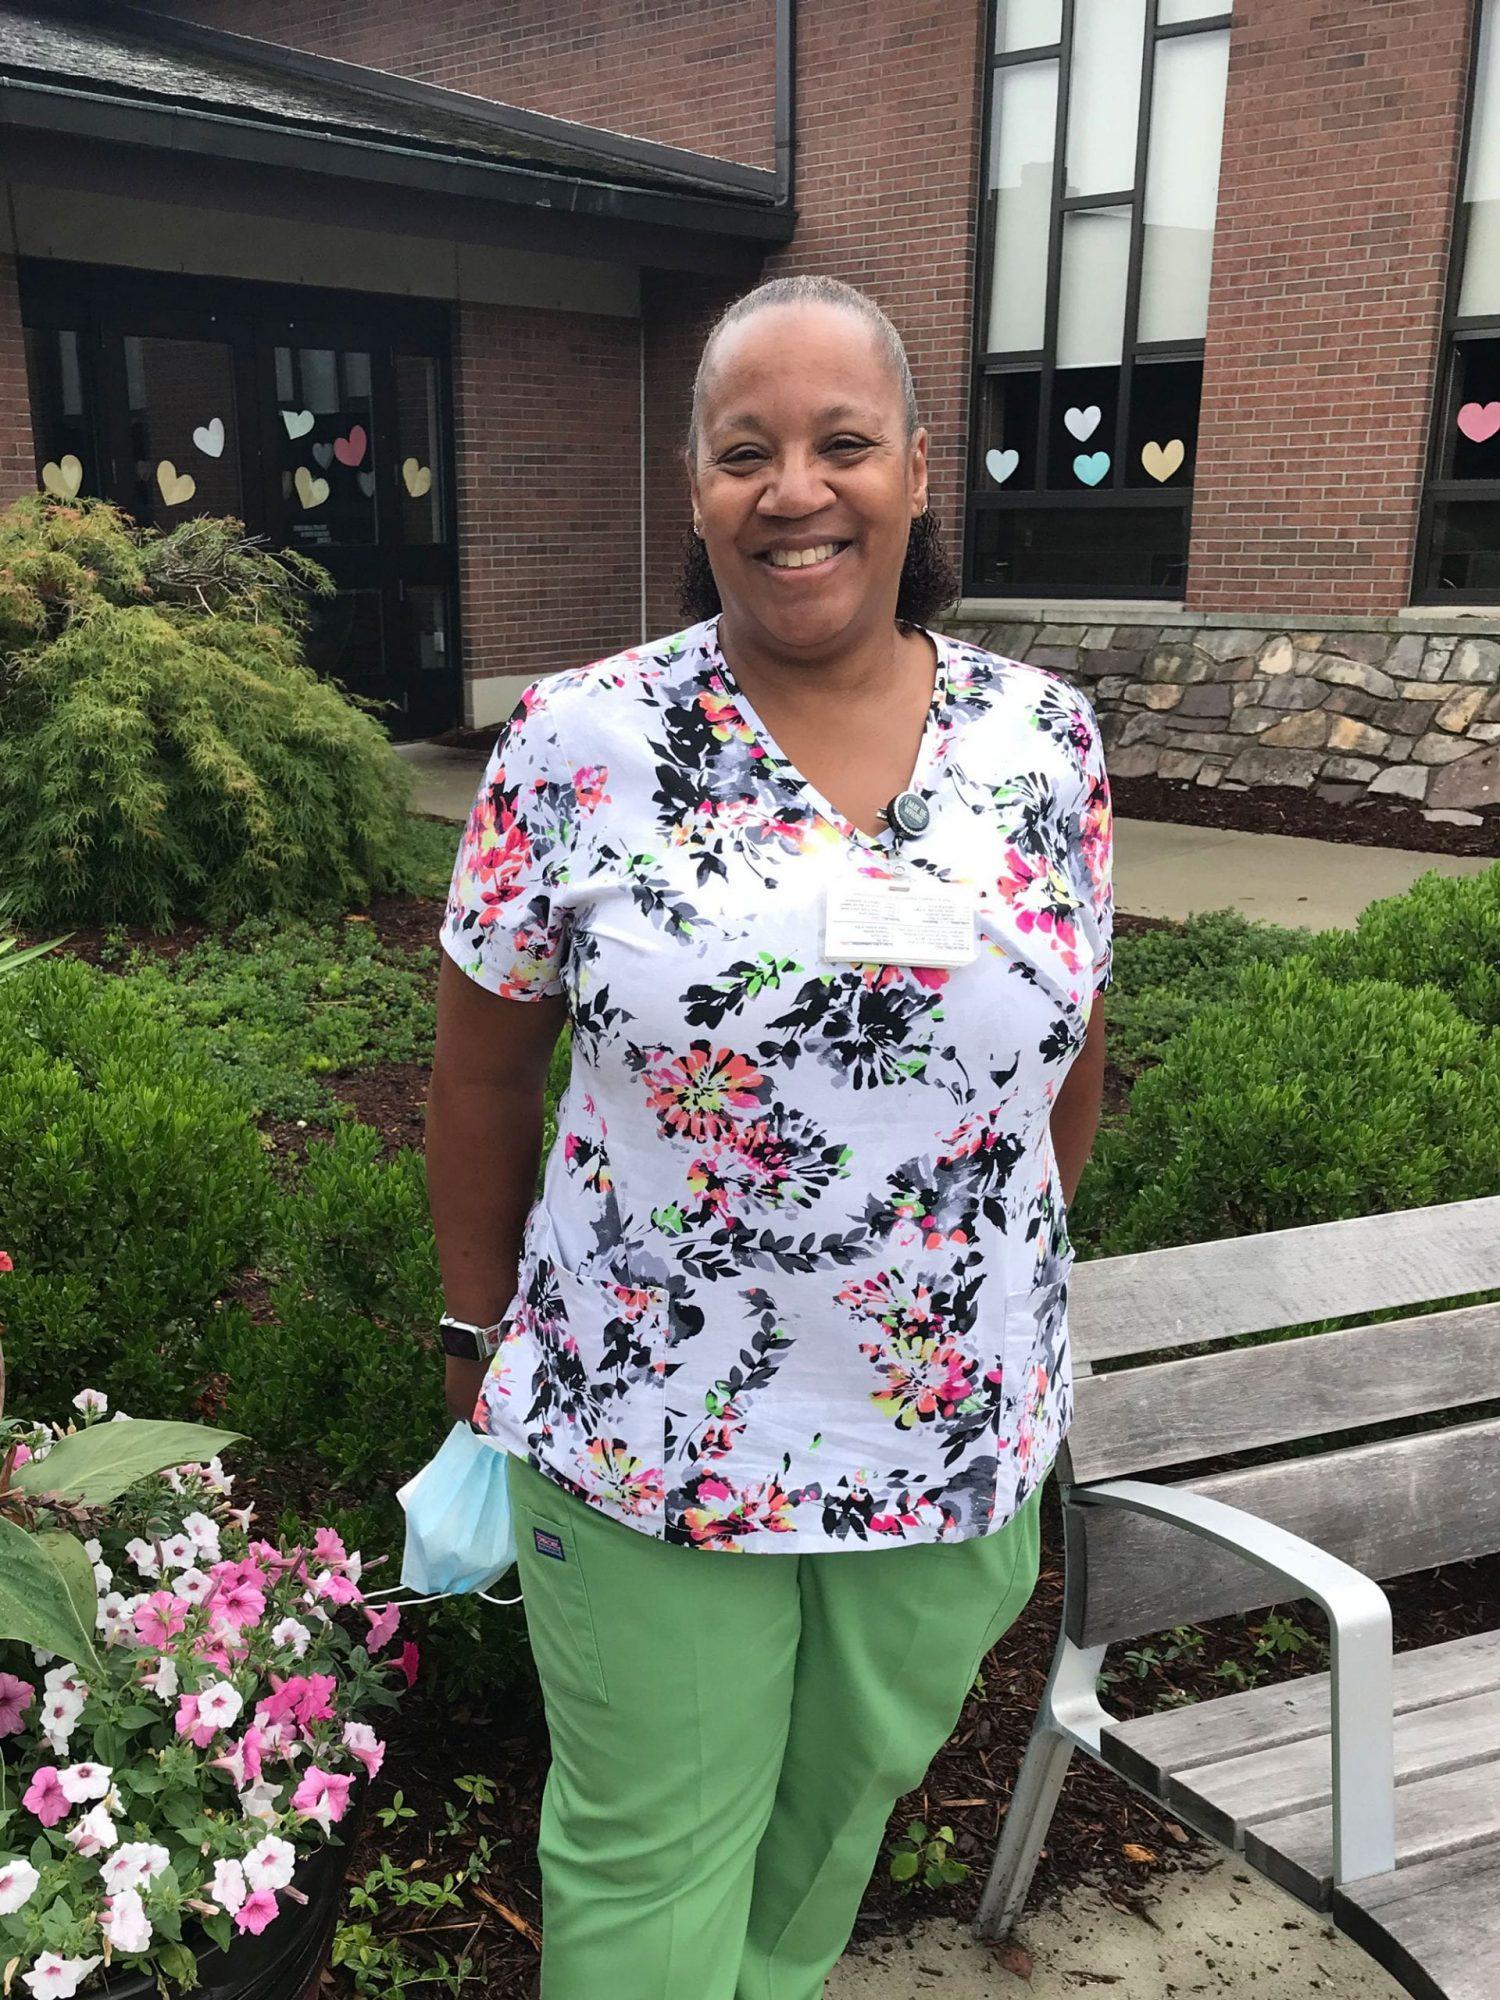 Donnette Barnett, CNA at Wernick Adult Day Health